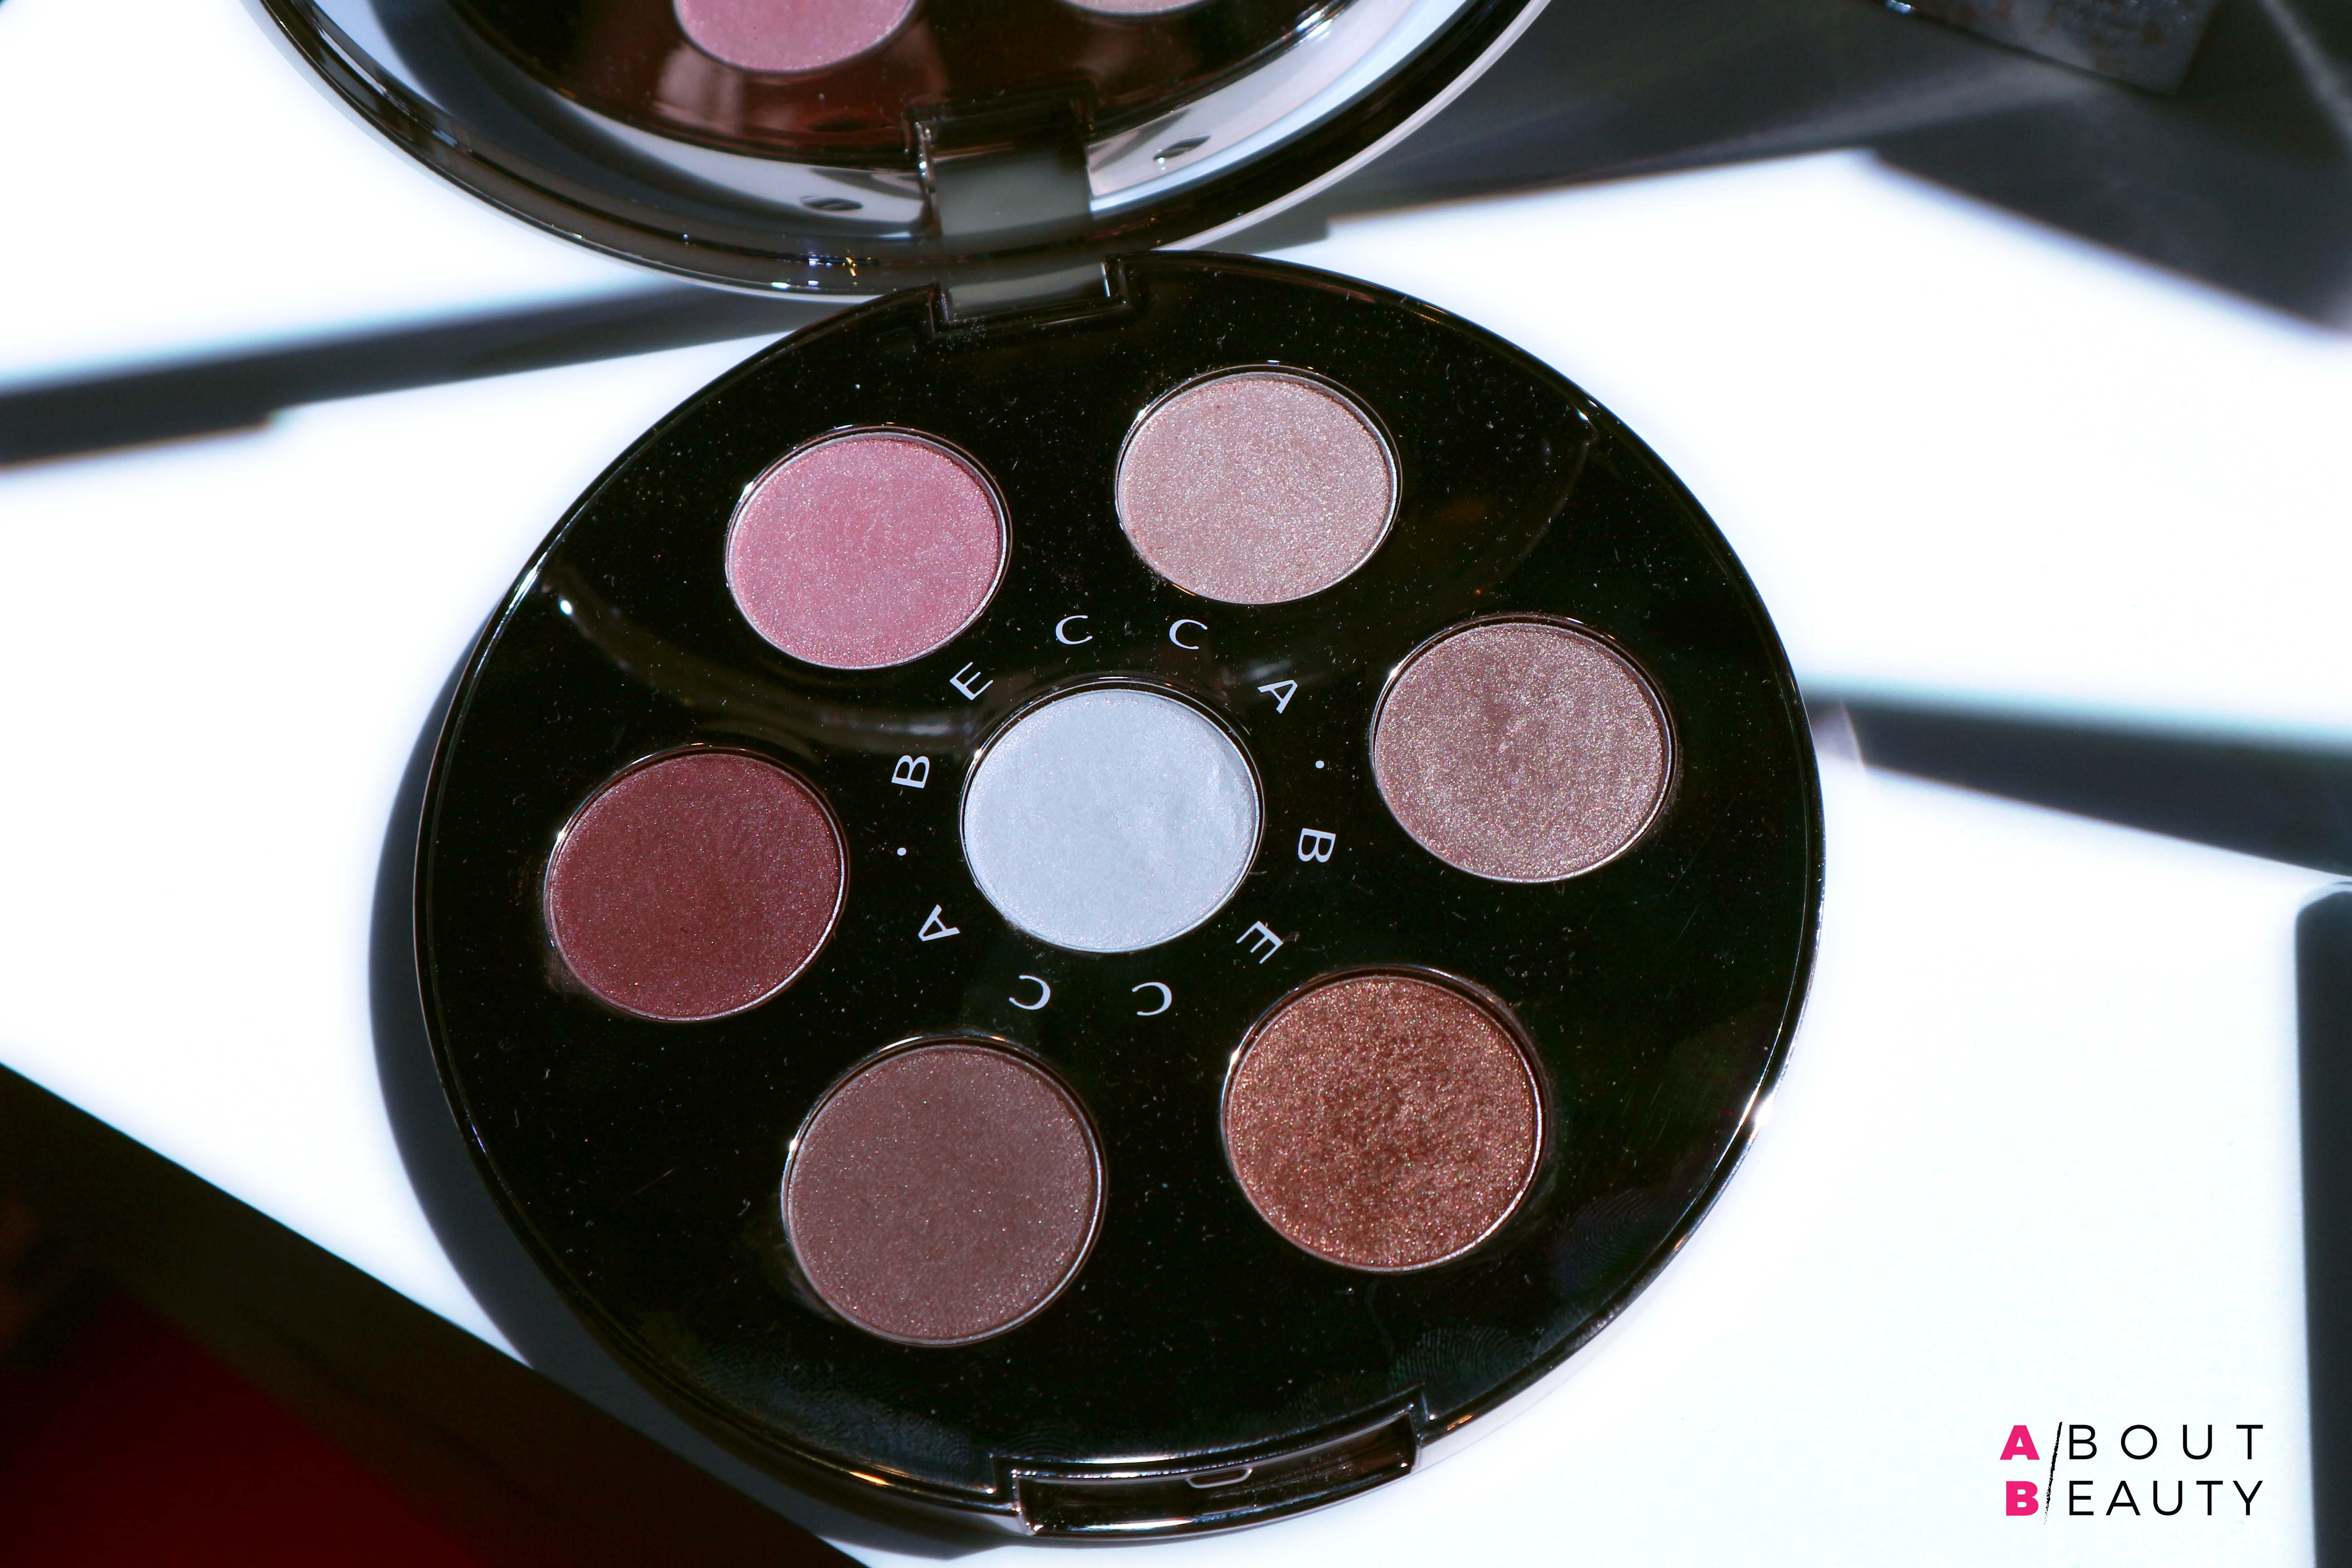 Novità Natalizie Becca Cosmetics 2017: info, foto, swatch, prezzi - La palette occhi Apres Ski Glow Eye Light Palette